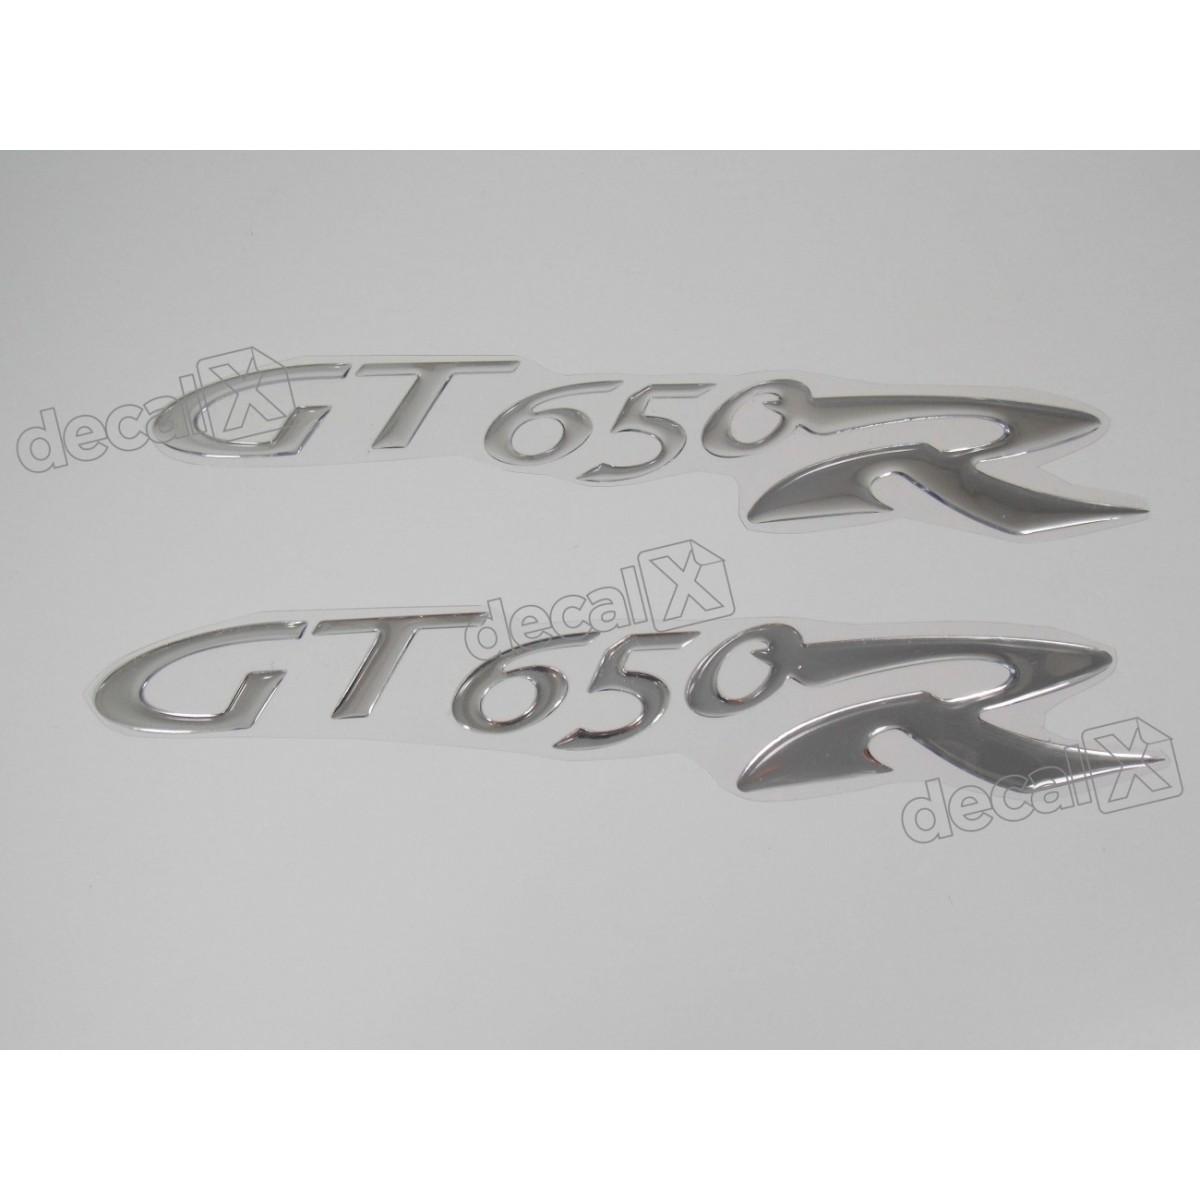 Par Adesivos Kasinski Gt 650r Resinado Cromado 25x4,5 Cms